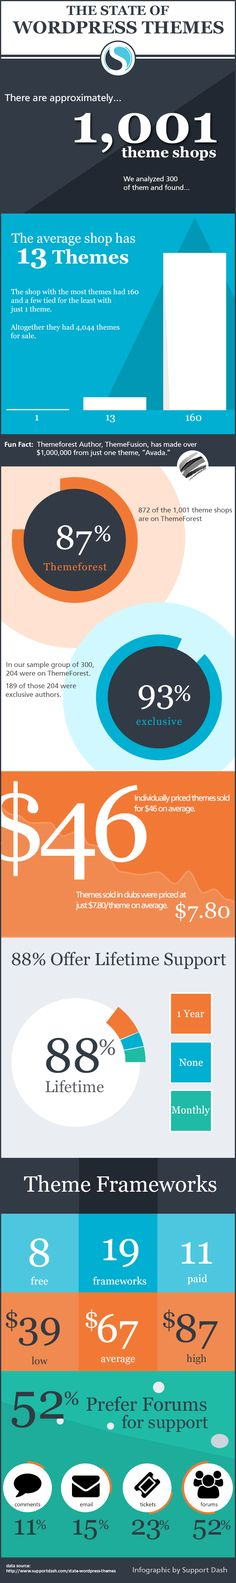 The State of #WordPress Themes. Bespoke Social Media & Marketing